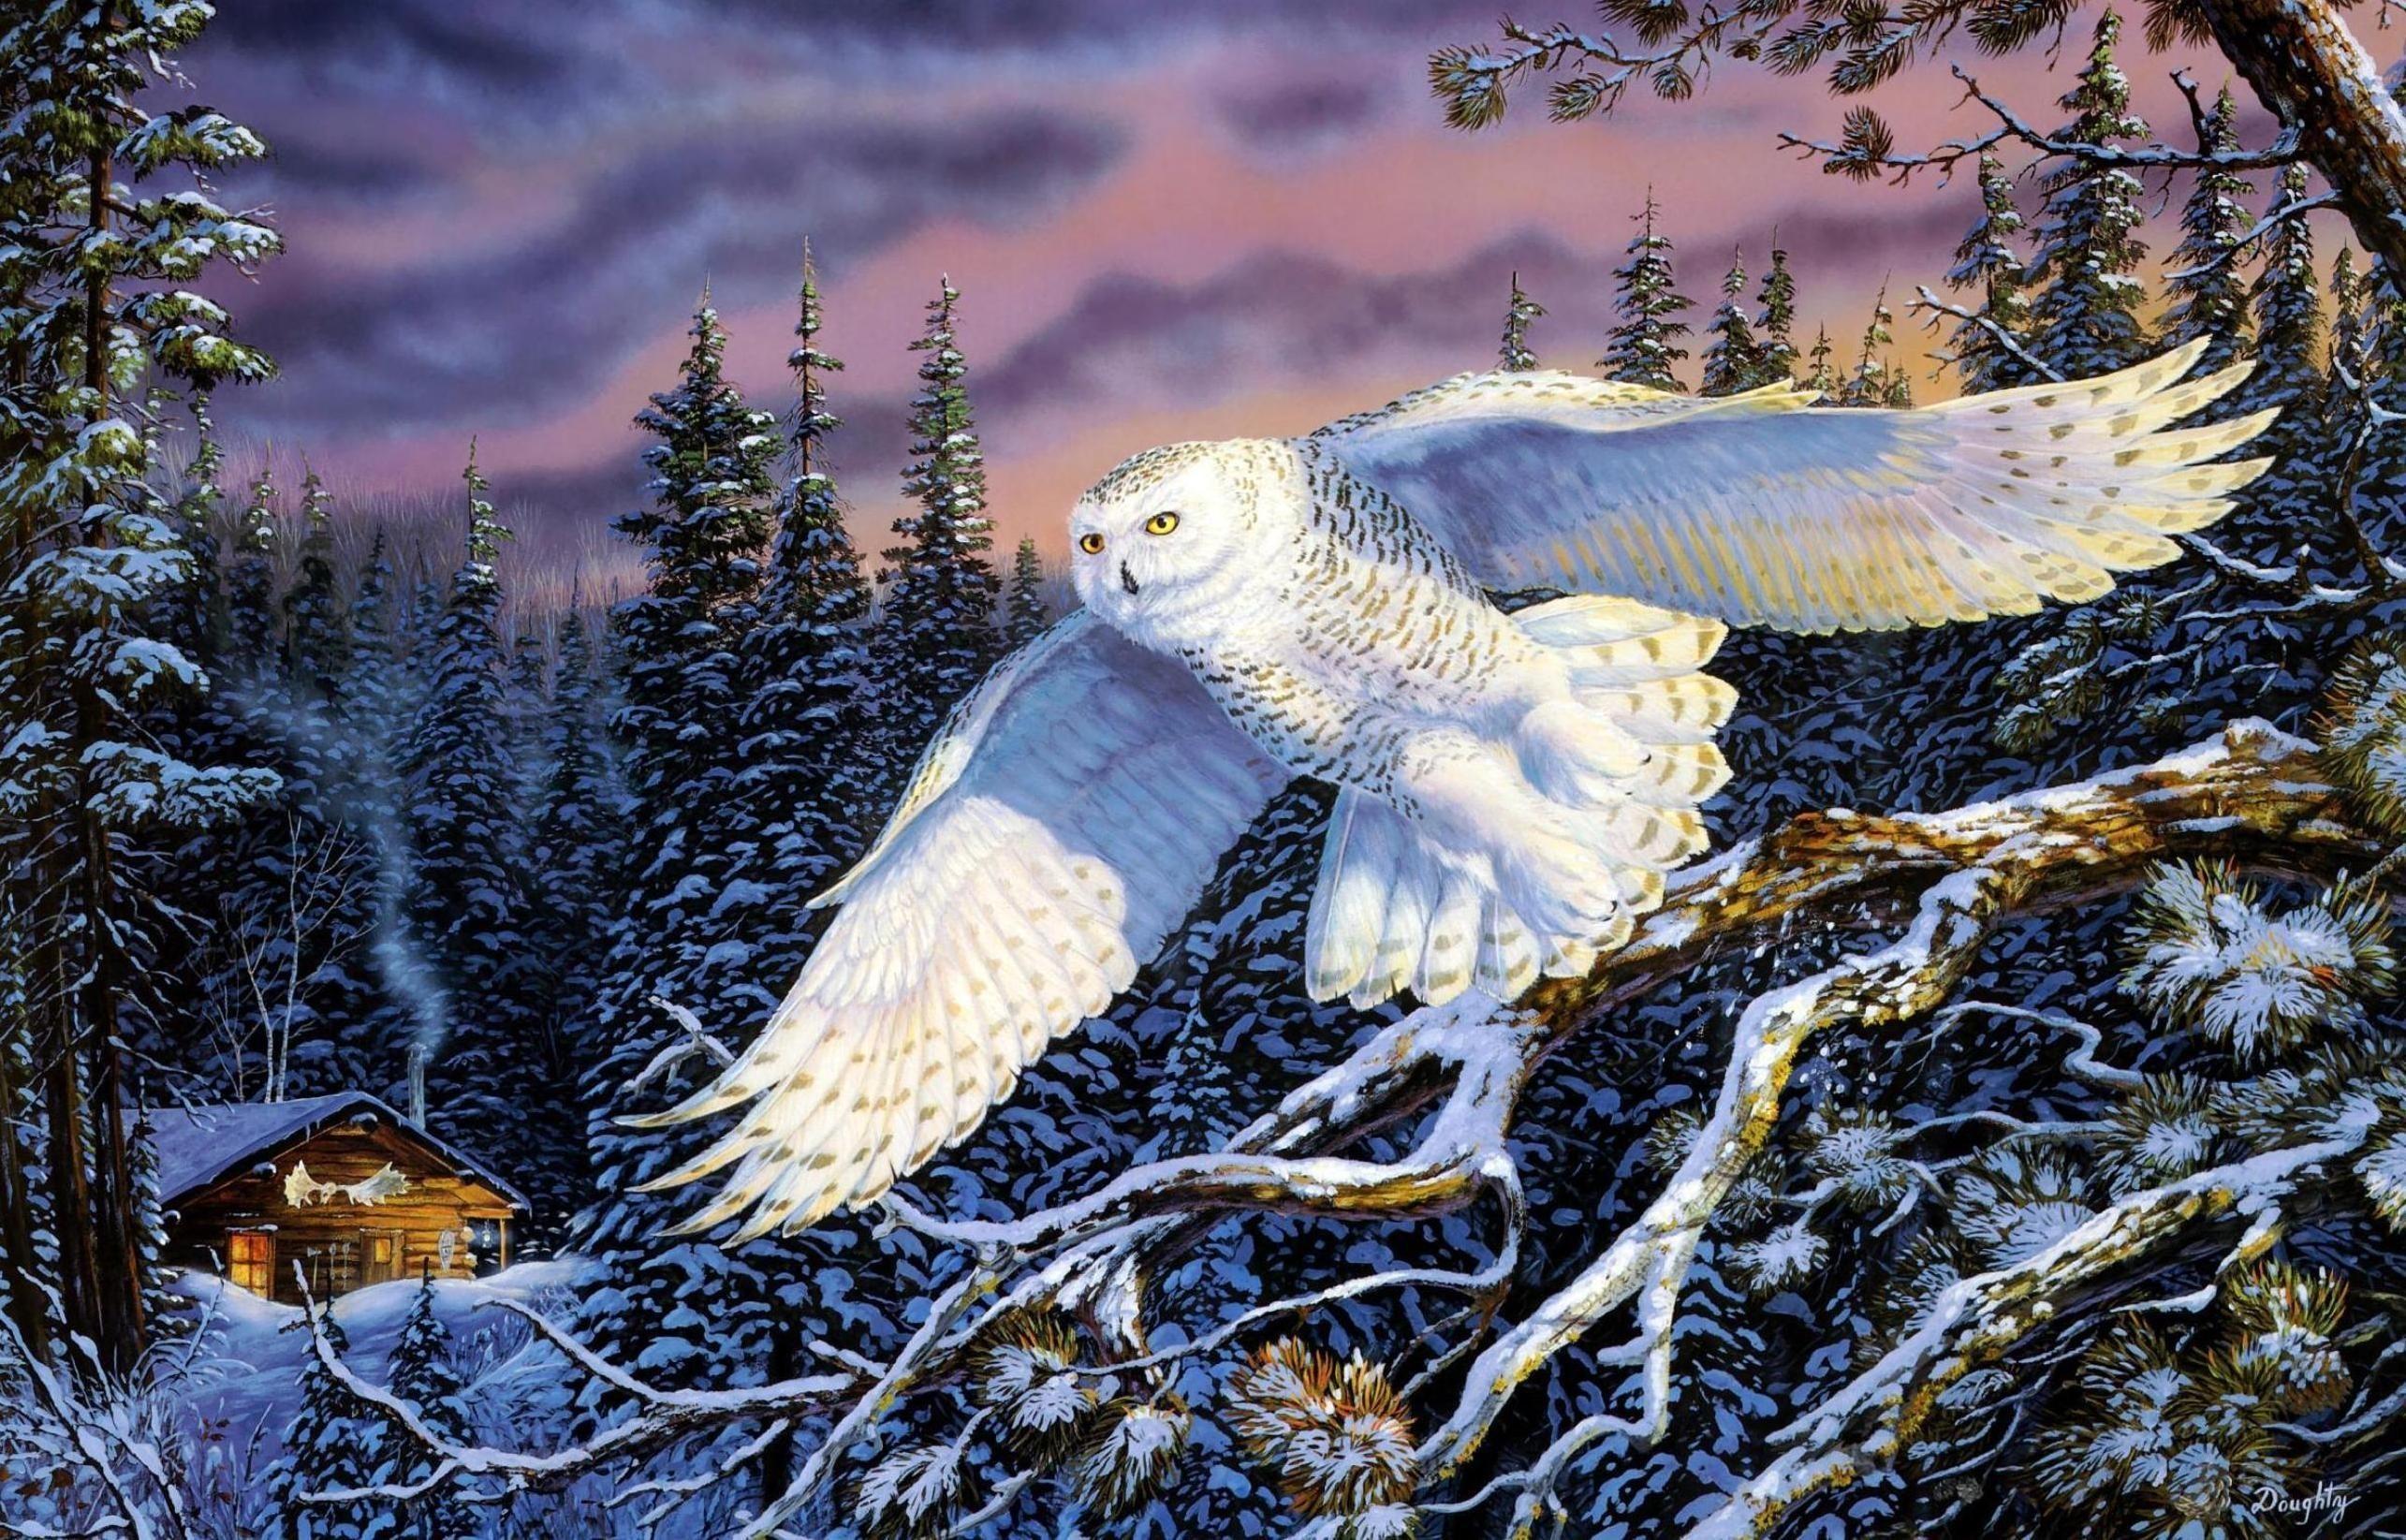 px hd wallpaper snowy owl by Franklin Edwards for :  pocketfullofgrace.com